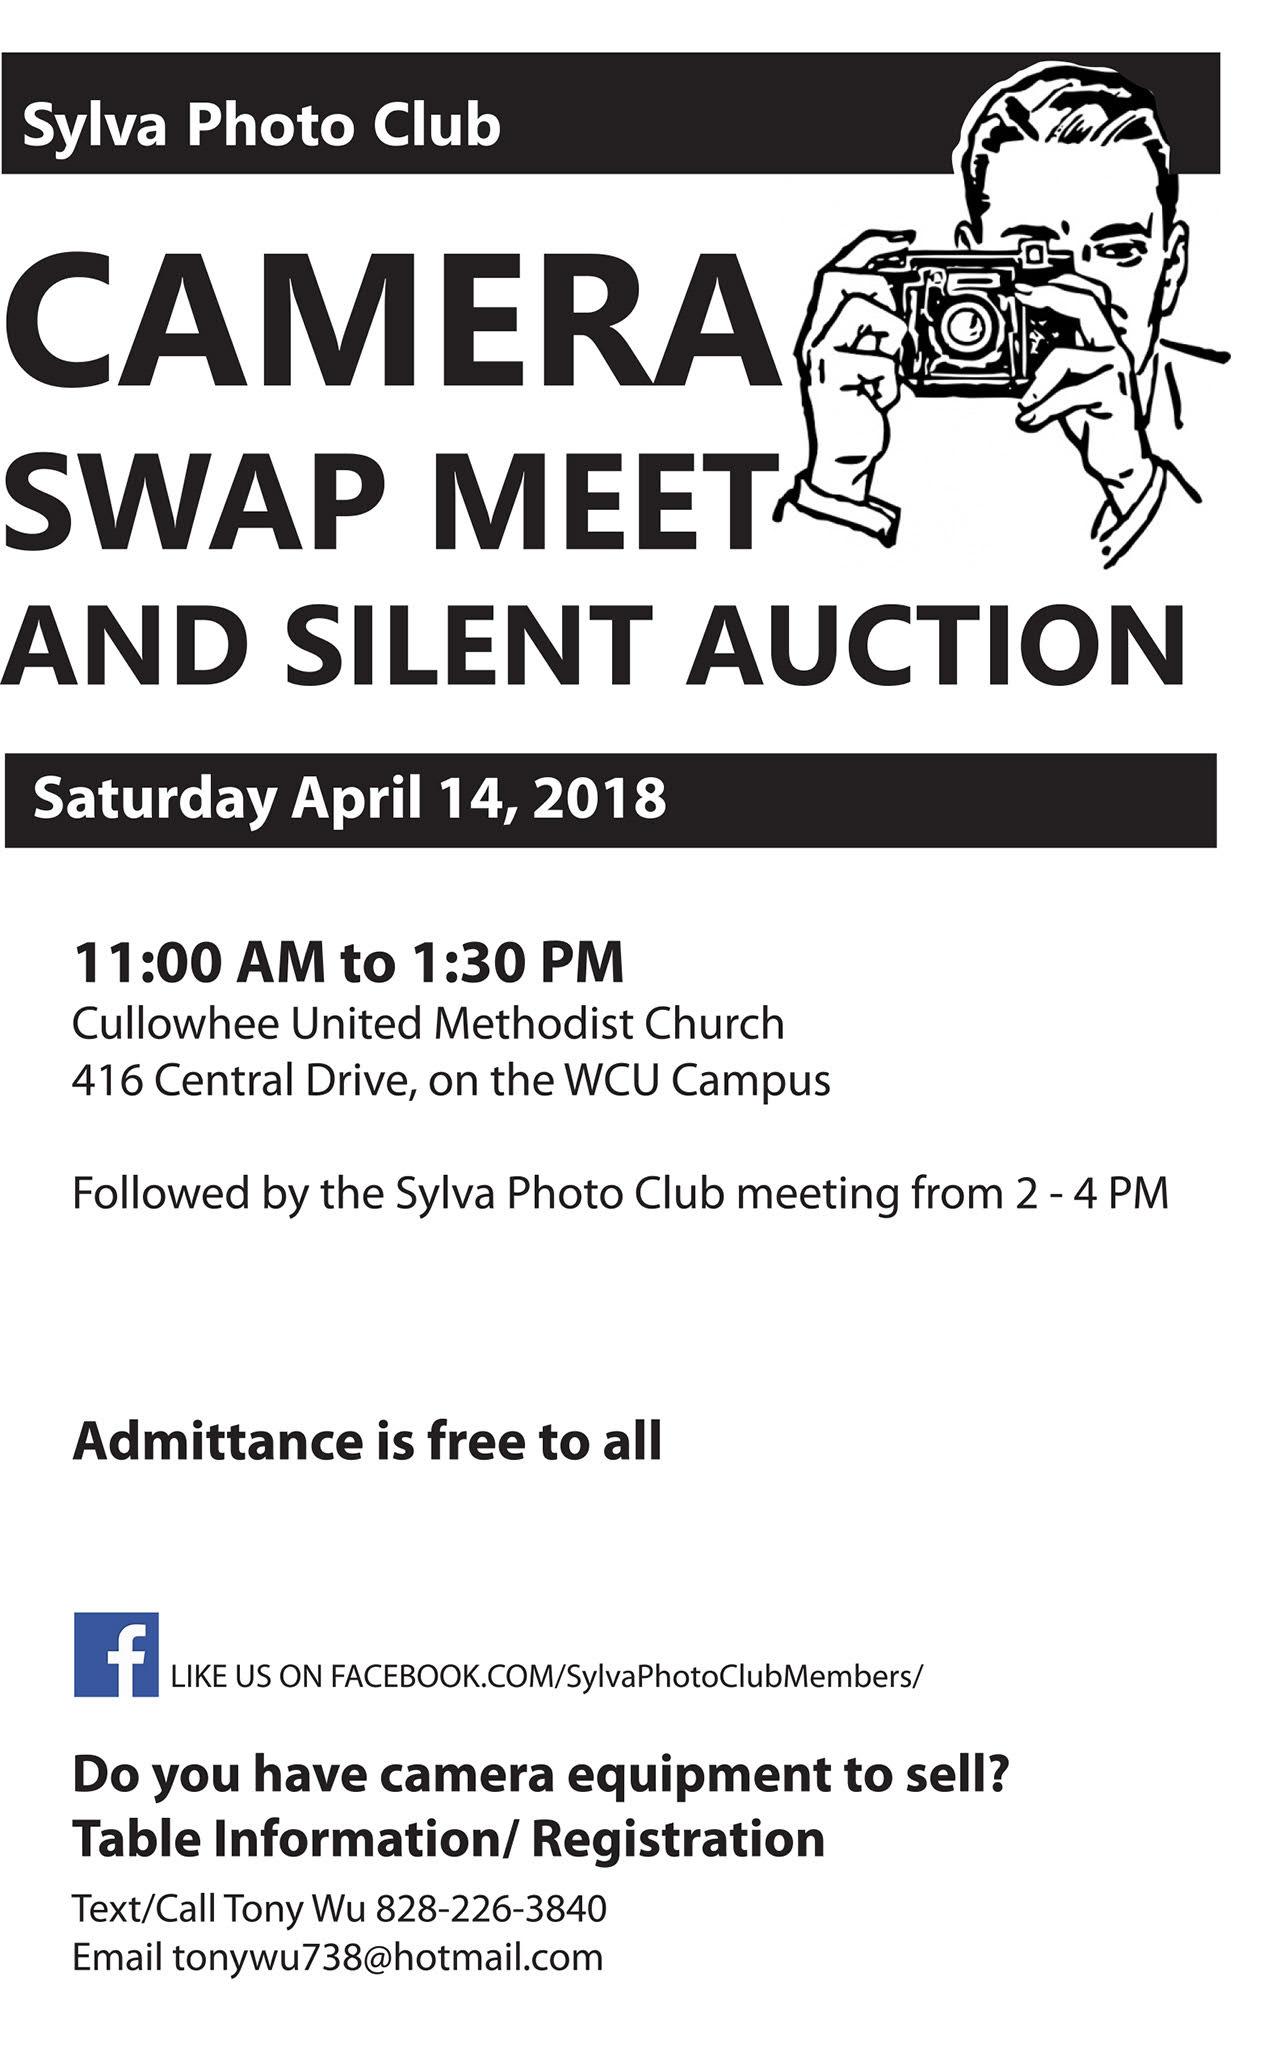 Swap Meet Information April 14, 2018   SylvaPhotoClub